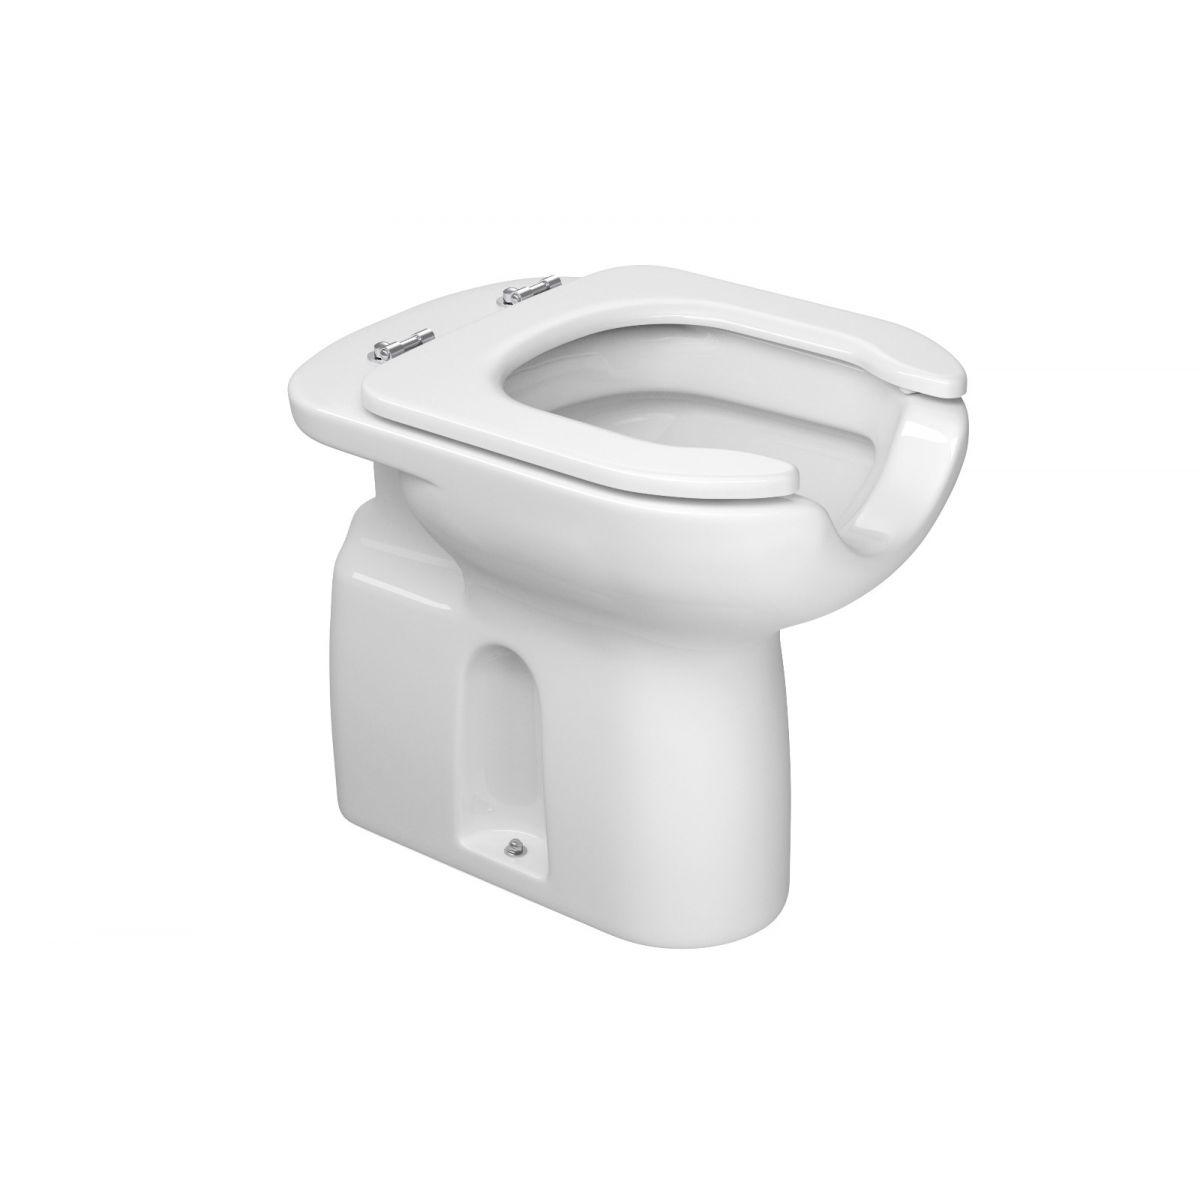 Bacia Conforto c/ Abertura Frontal Branco Vogue Plus - Deca - P.51.17